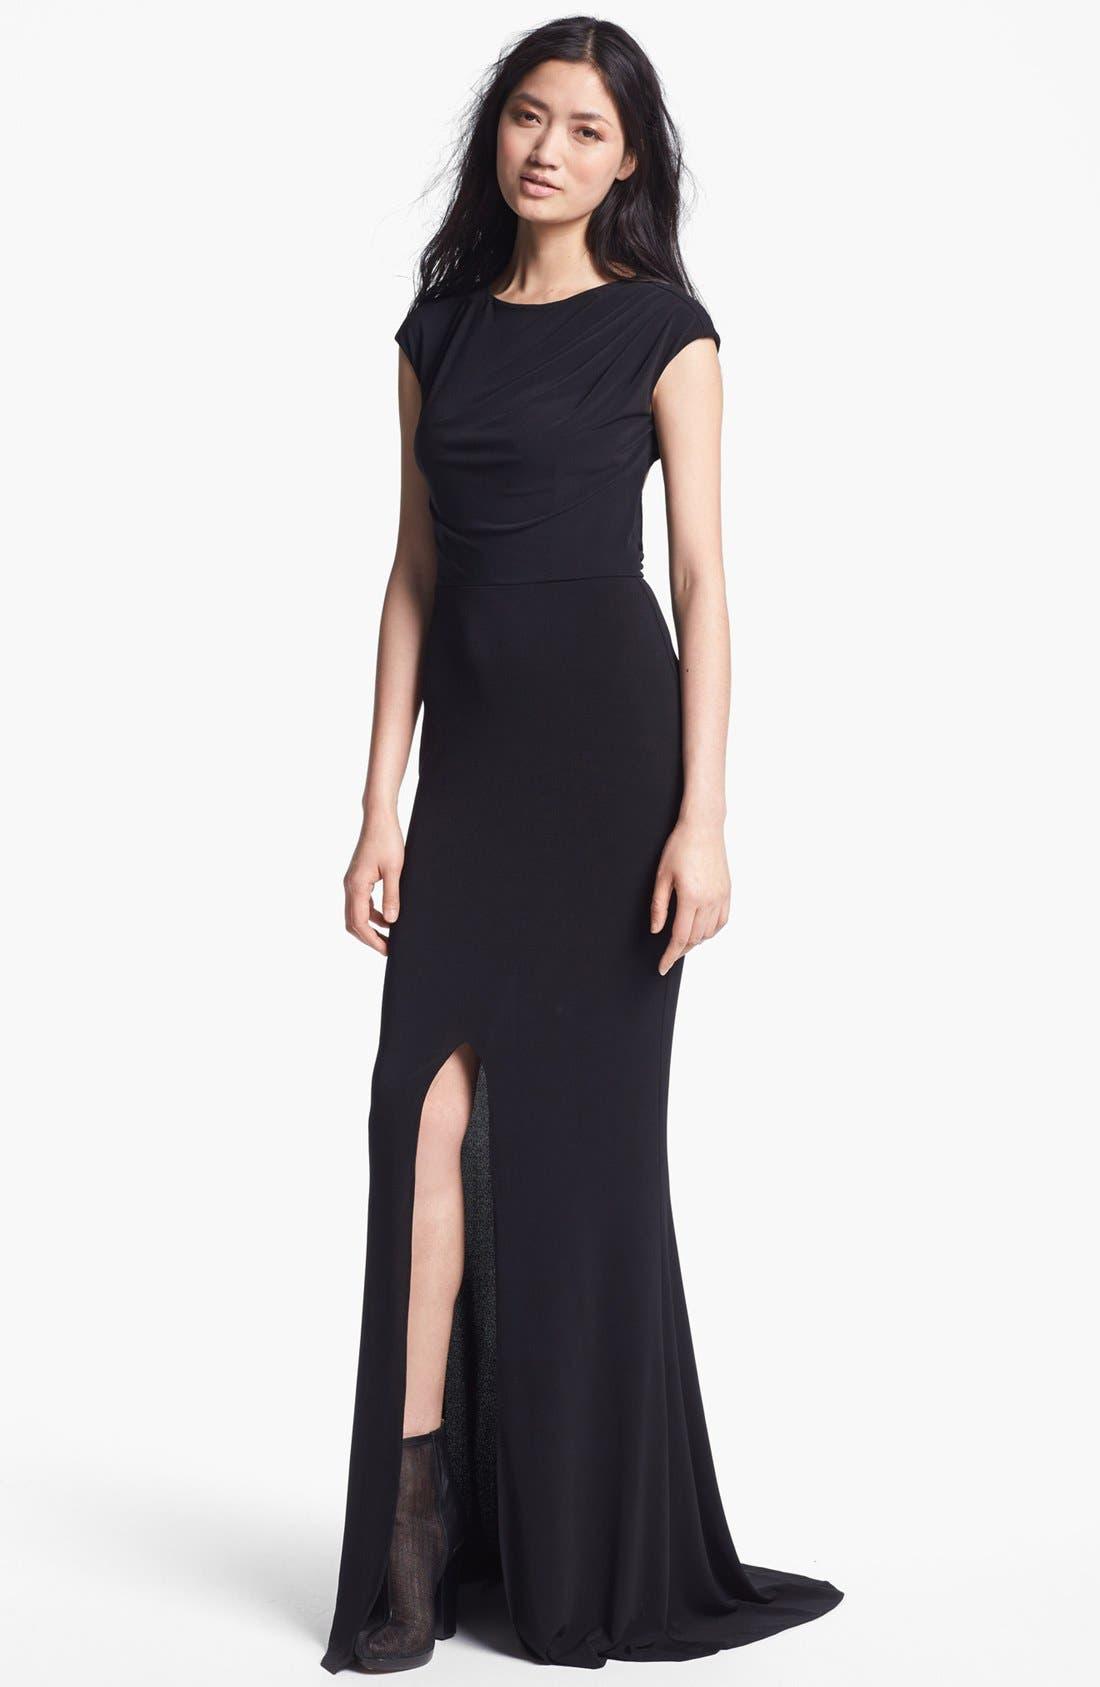 Alternate Image 1 Selected - Rachel Zoe 'Adriana' Mermaid Maxi Dress